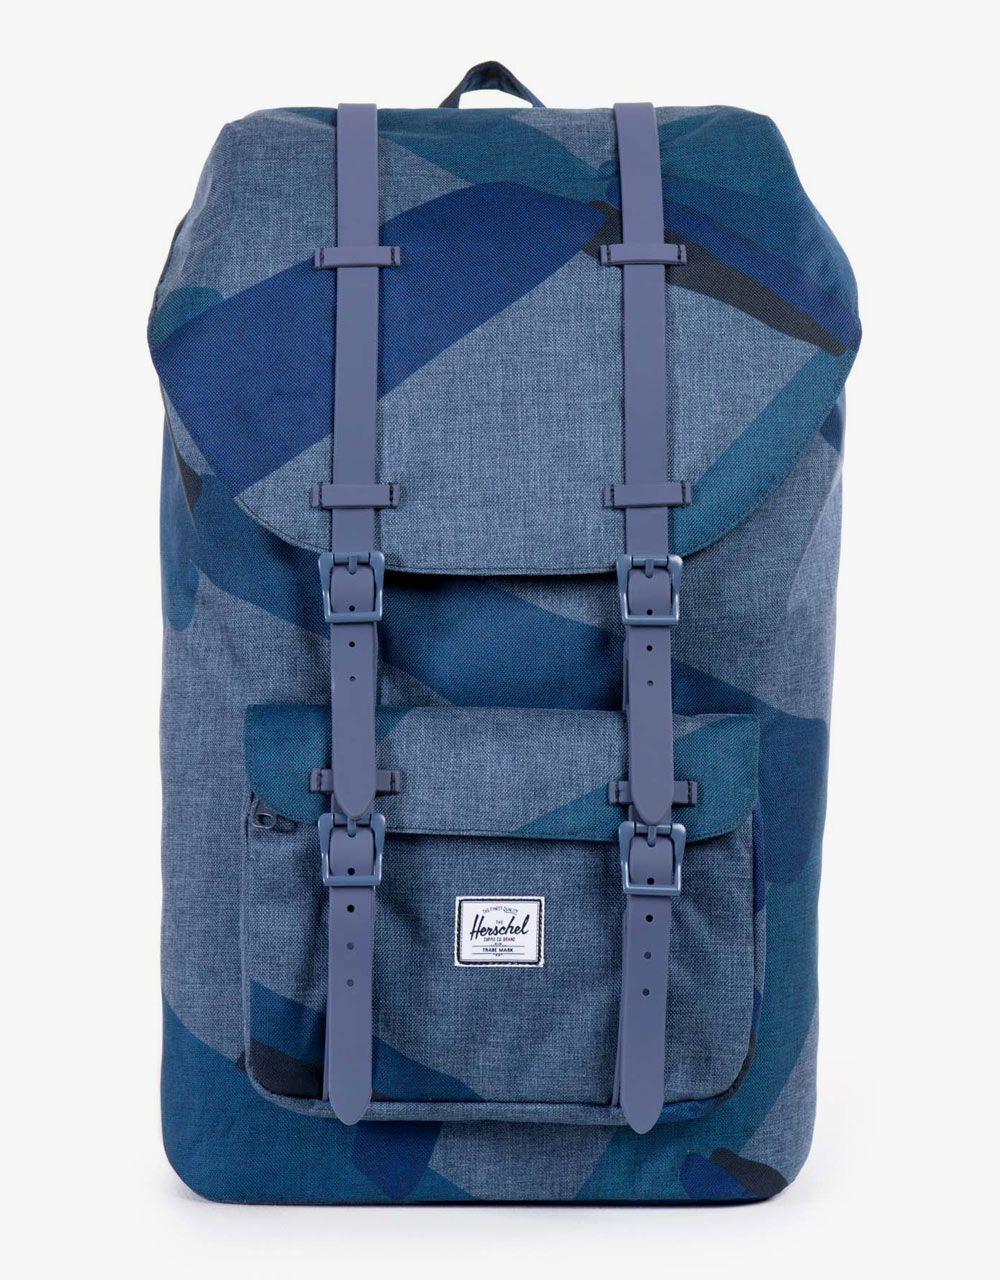 aa1e2d8994c Herschel Supply Co. Little America Backpack - Navy Portal Navy Rubber